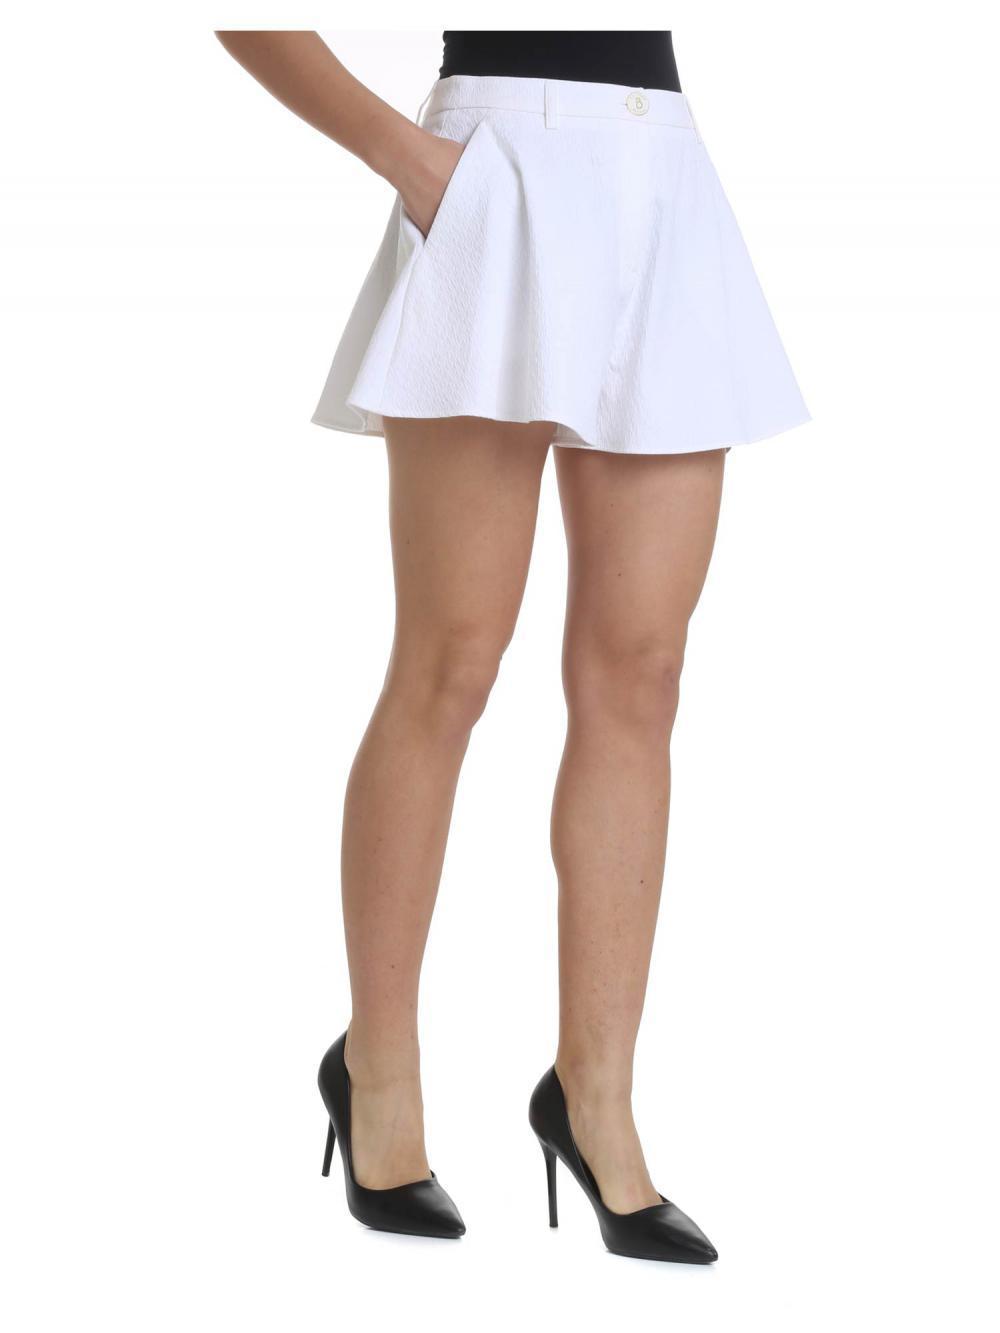 shorts-boutique-moschino-cod-a0305